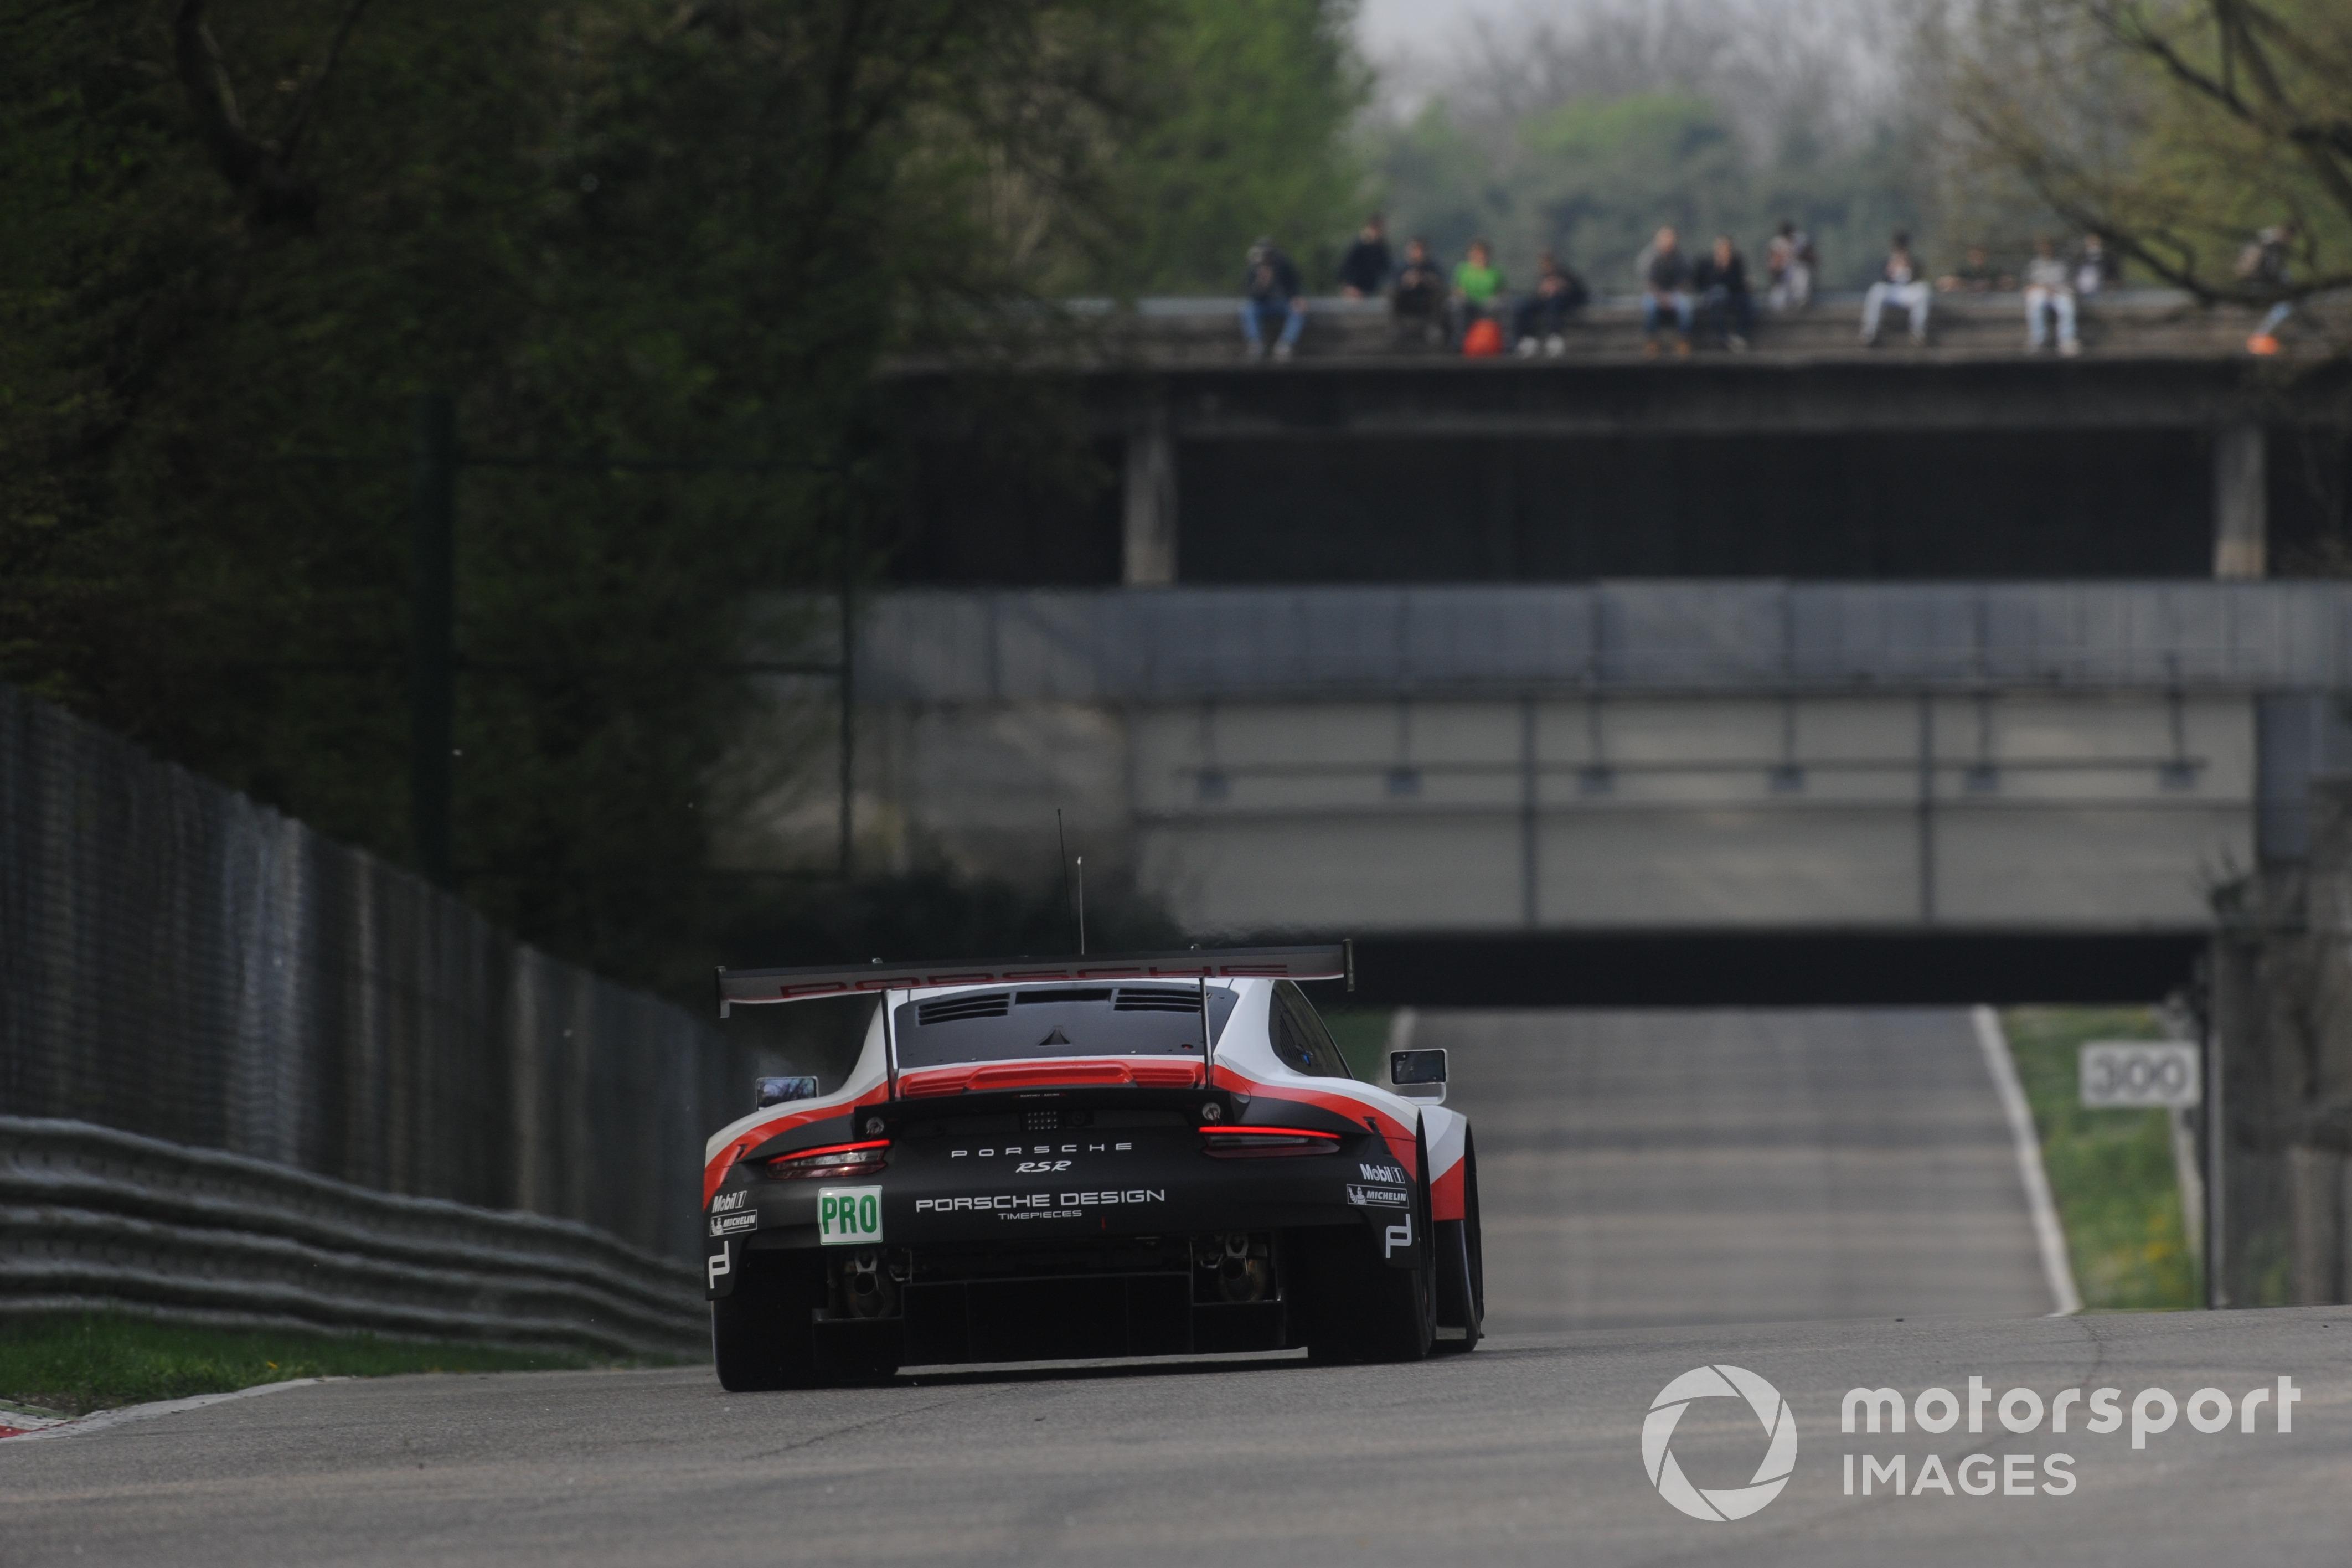 2017 FIA World Endurance Championship, 31st March - 2nd April, 2017, Monza Prologue, Michael Christensen (DNK) \ Kevin Estre (FRA) - PORSCHE GT TEAM - Porsche 911 RSR